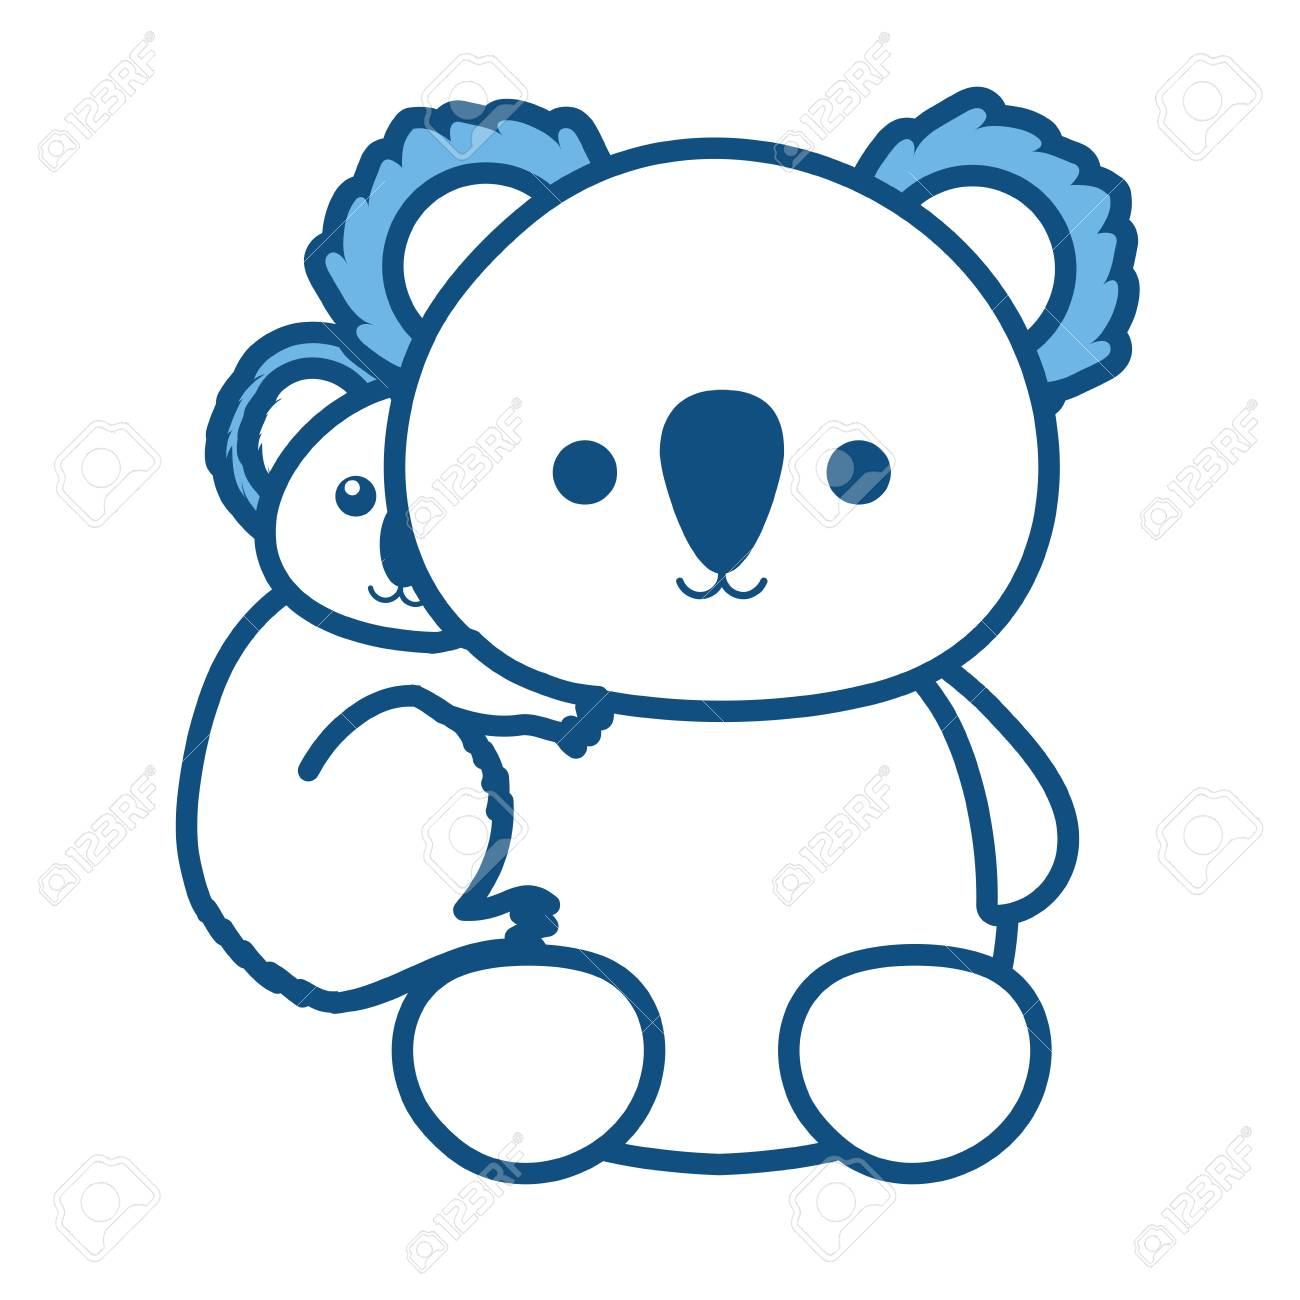 hight resolution of koala bear illustration stock vector 92215407